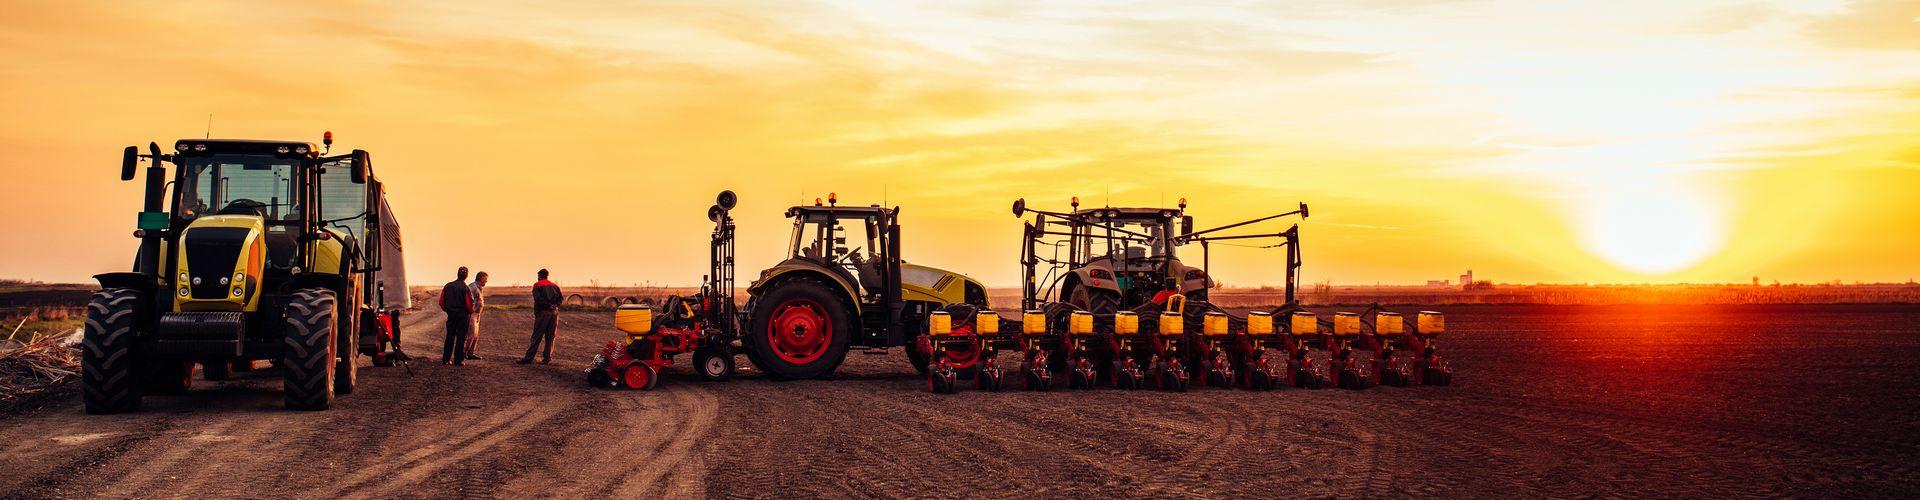 slider-1-traktor-servis